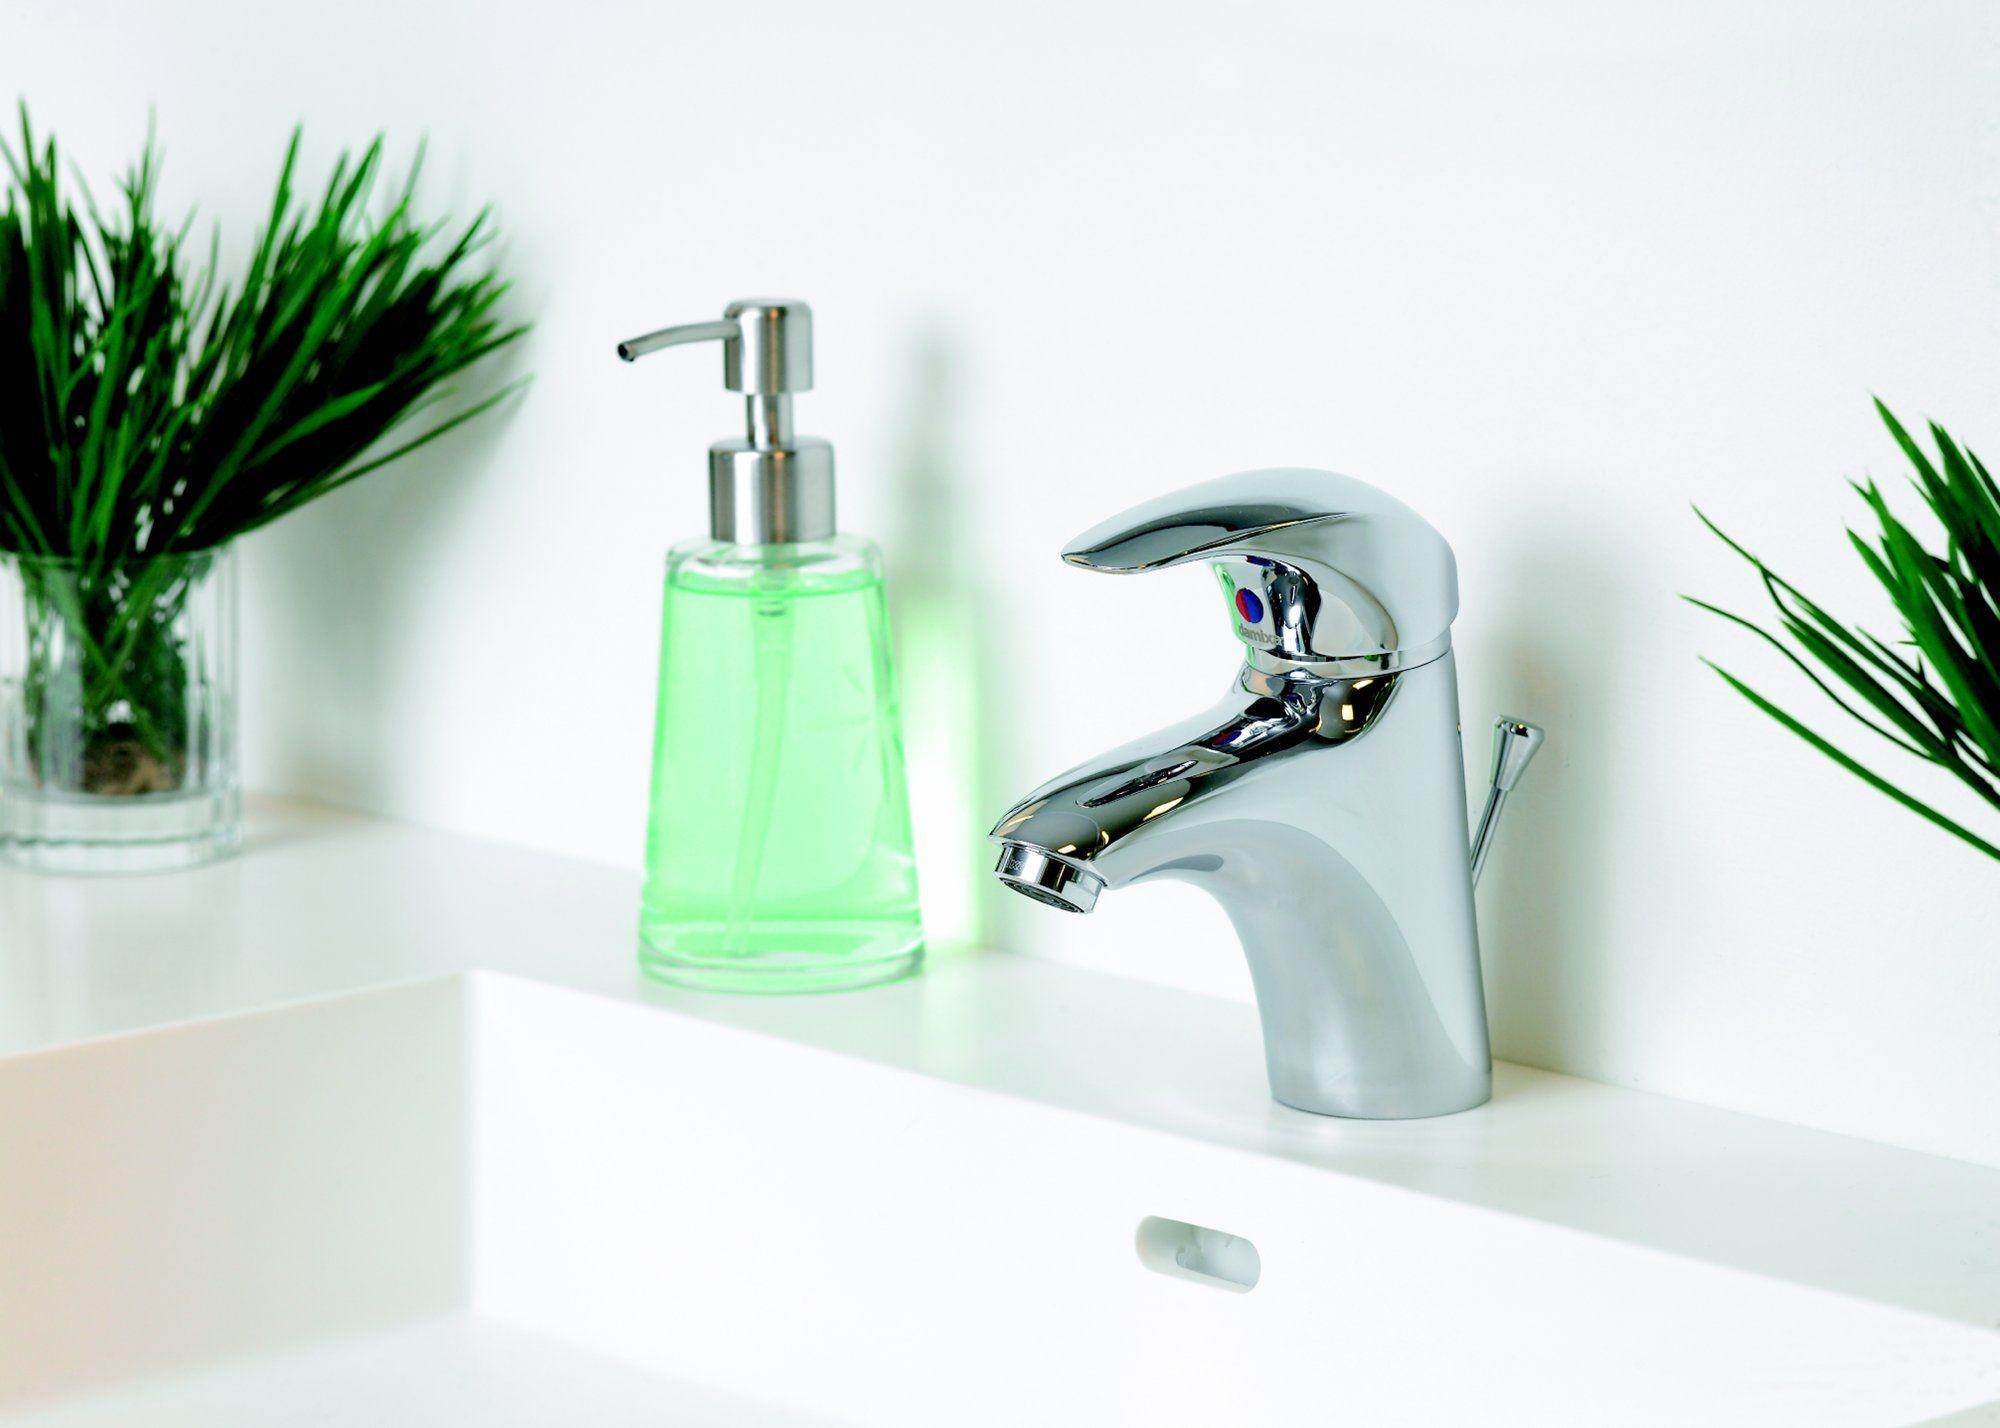 Damixa Space lavabokraan met trekwaste 10821.   Damixa Space mitigeur  lavabo avec vidage au tirette 10821. c59beb4c8592